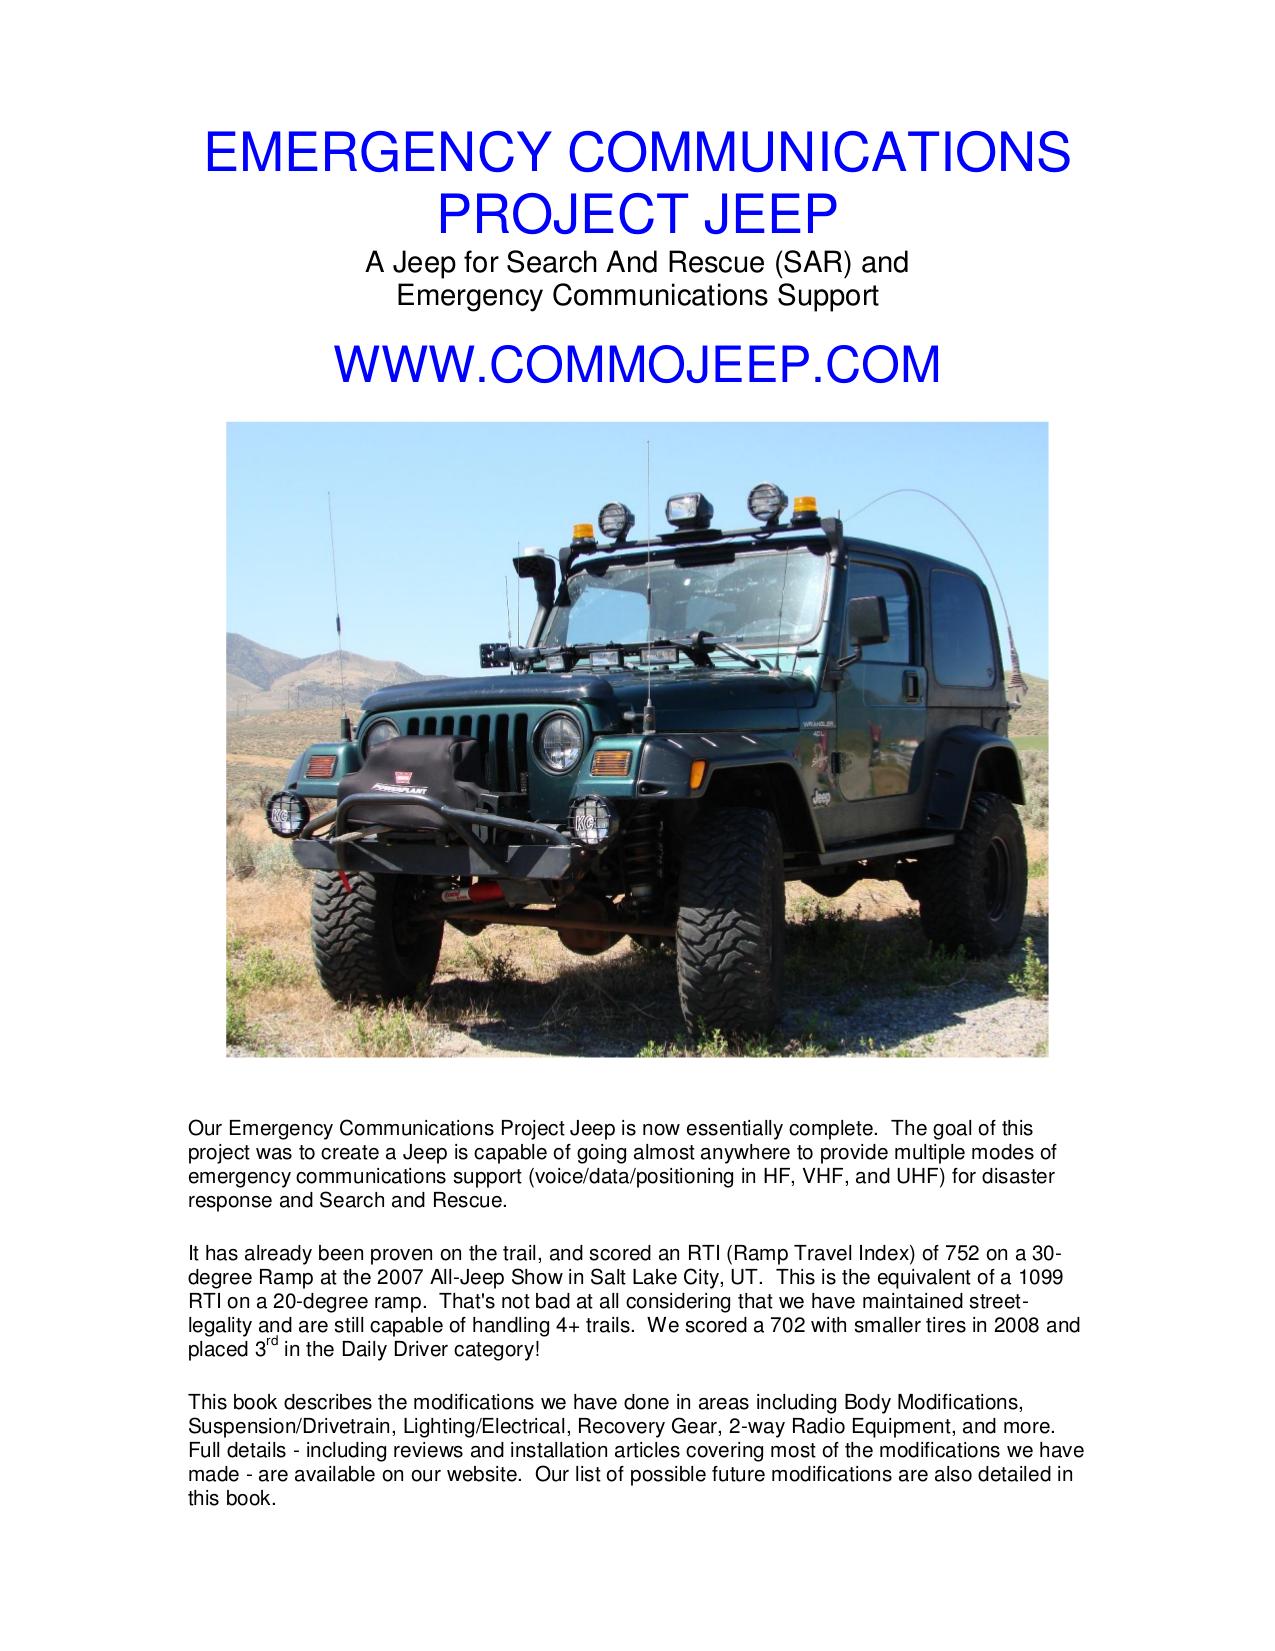 pdf for Lowrance GPS GlobalMap Baja 540C manual